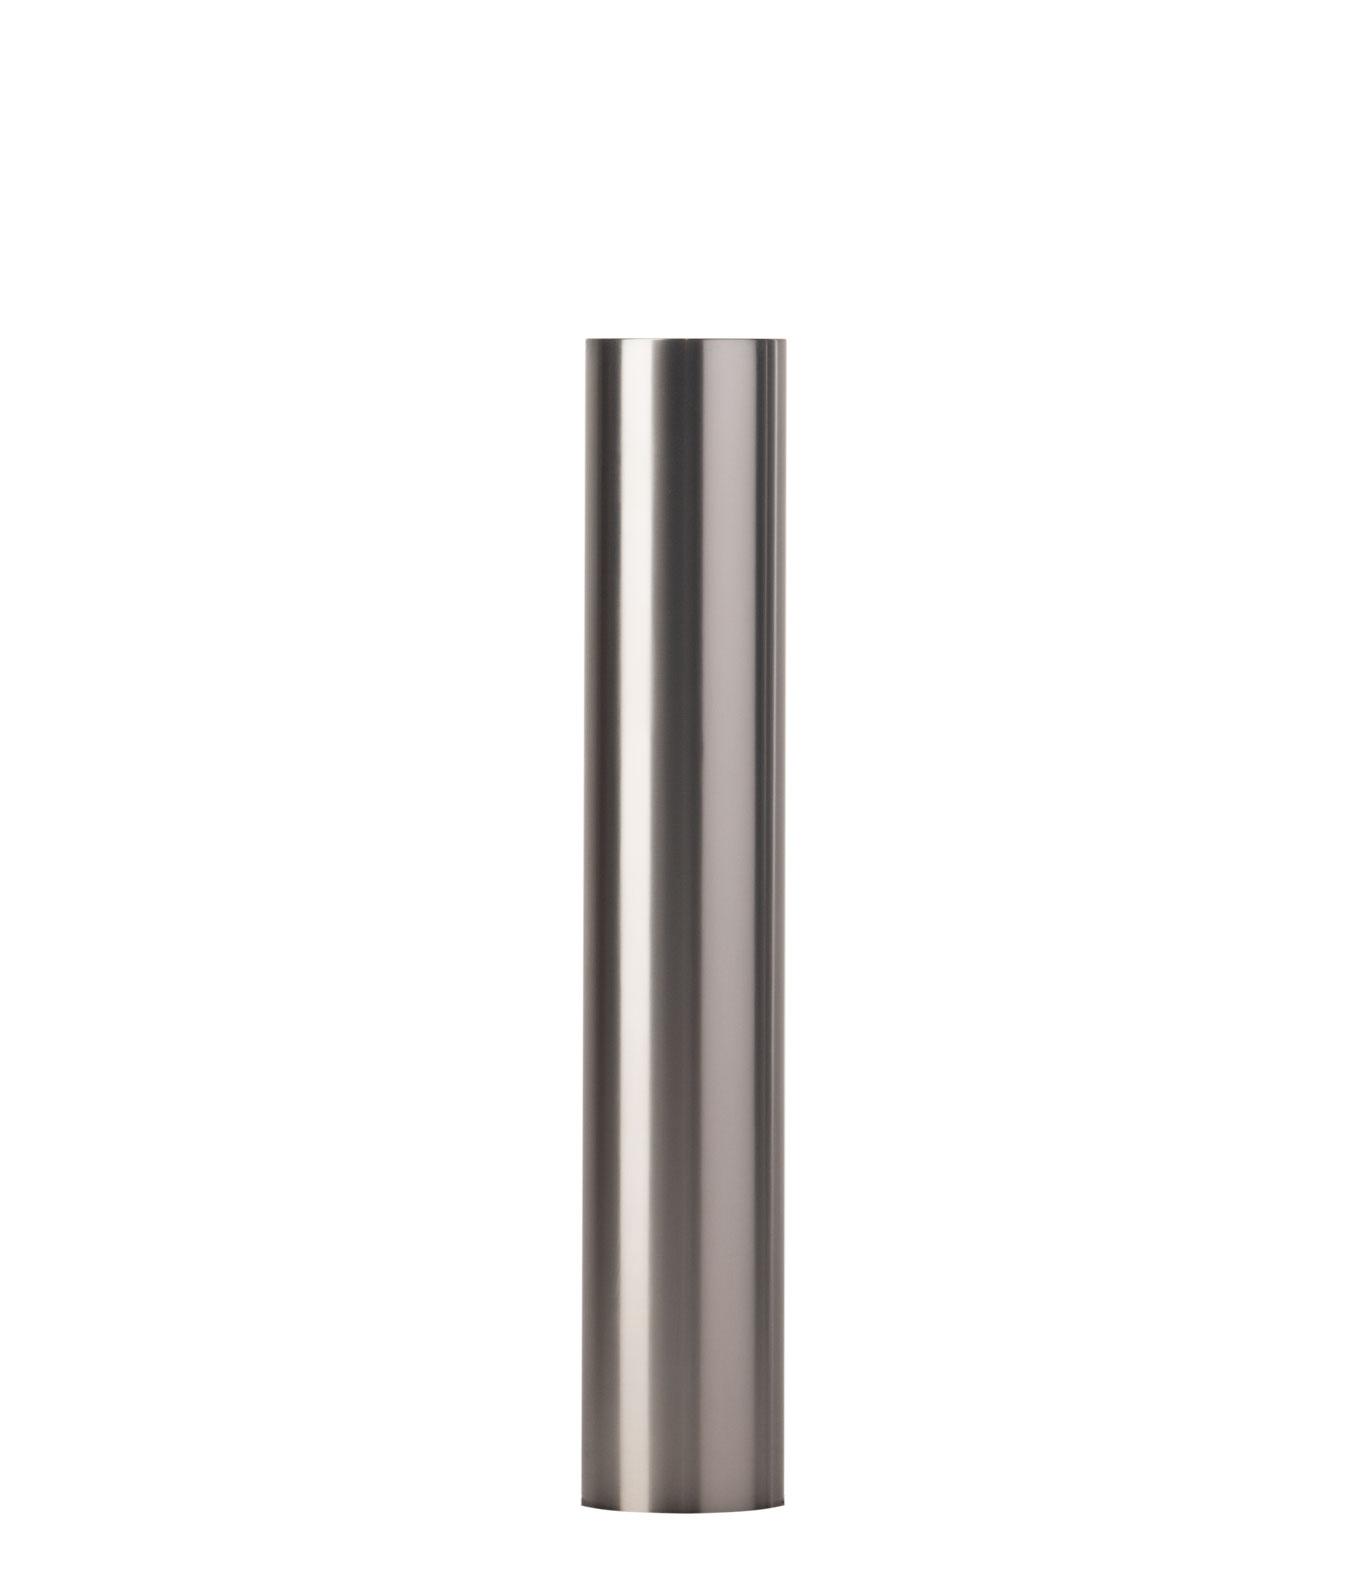 R-8914 Stainless Steel Bollard